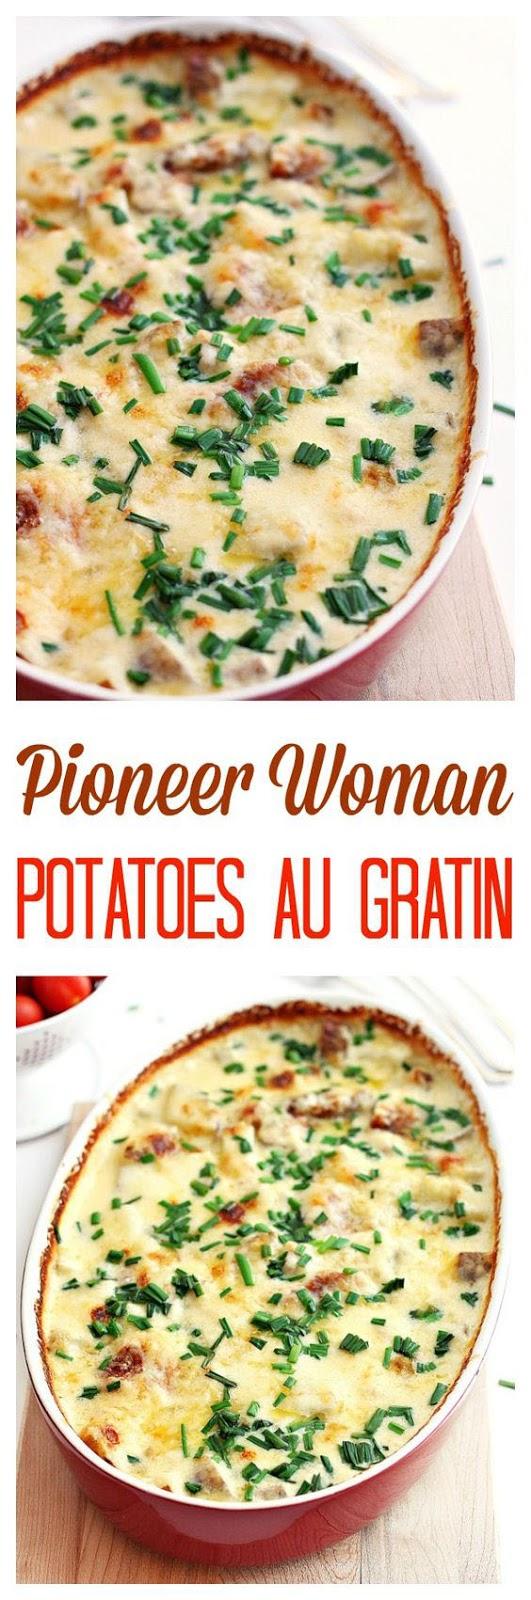 Pioneer Woman's potatoes au gratin